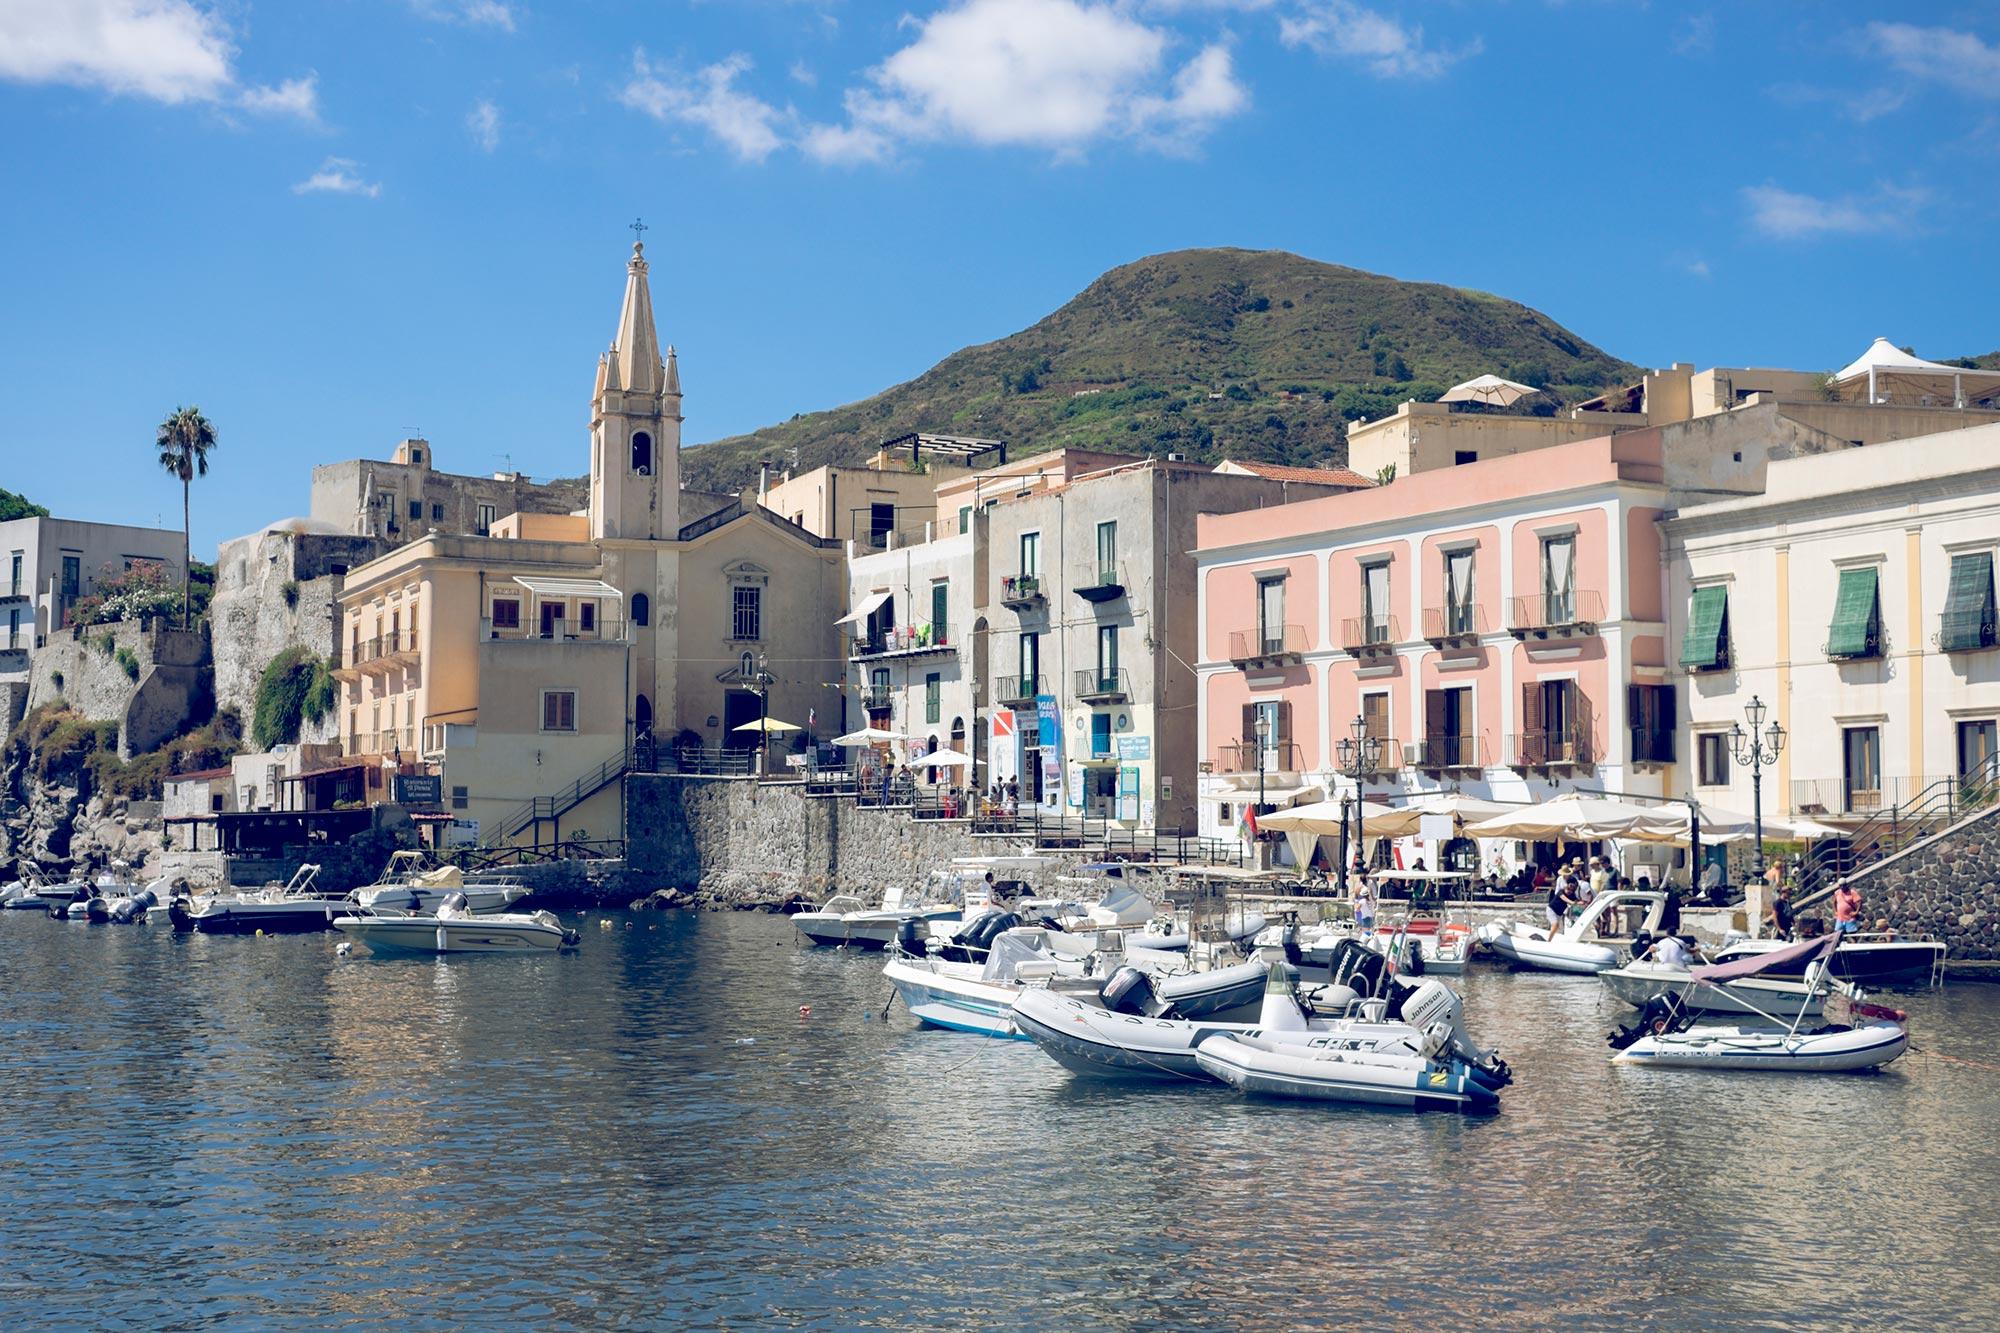 italy-sicilia-eolie-italy-sicilia-eolie-lipari-marina-corta-church